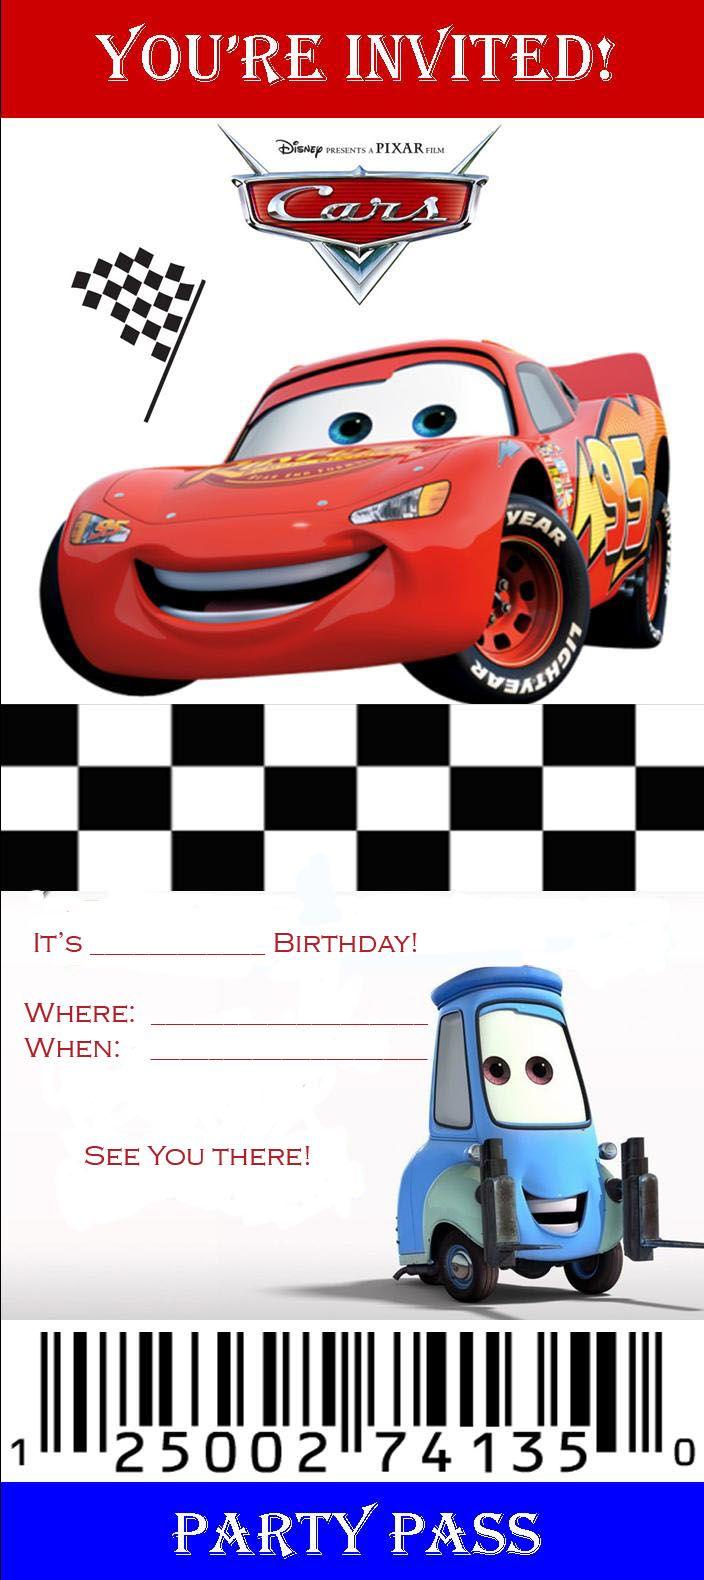 Free Invite3 1 Jpg 704 1 580 Pixels Geburtstag Einladung Vorlage Einladungskarten Geburtstag Einladung Kindergeburtstag